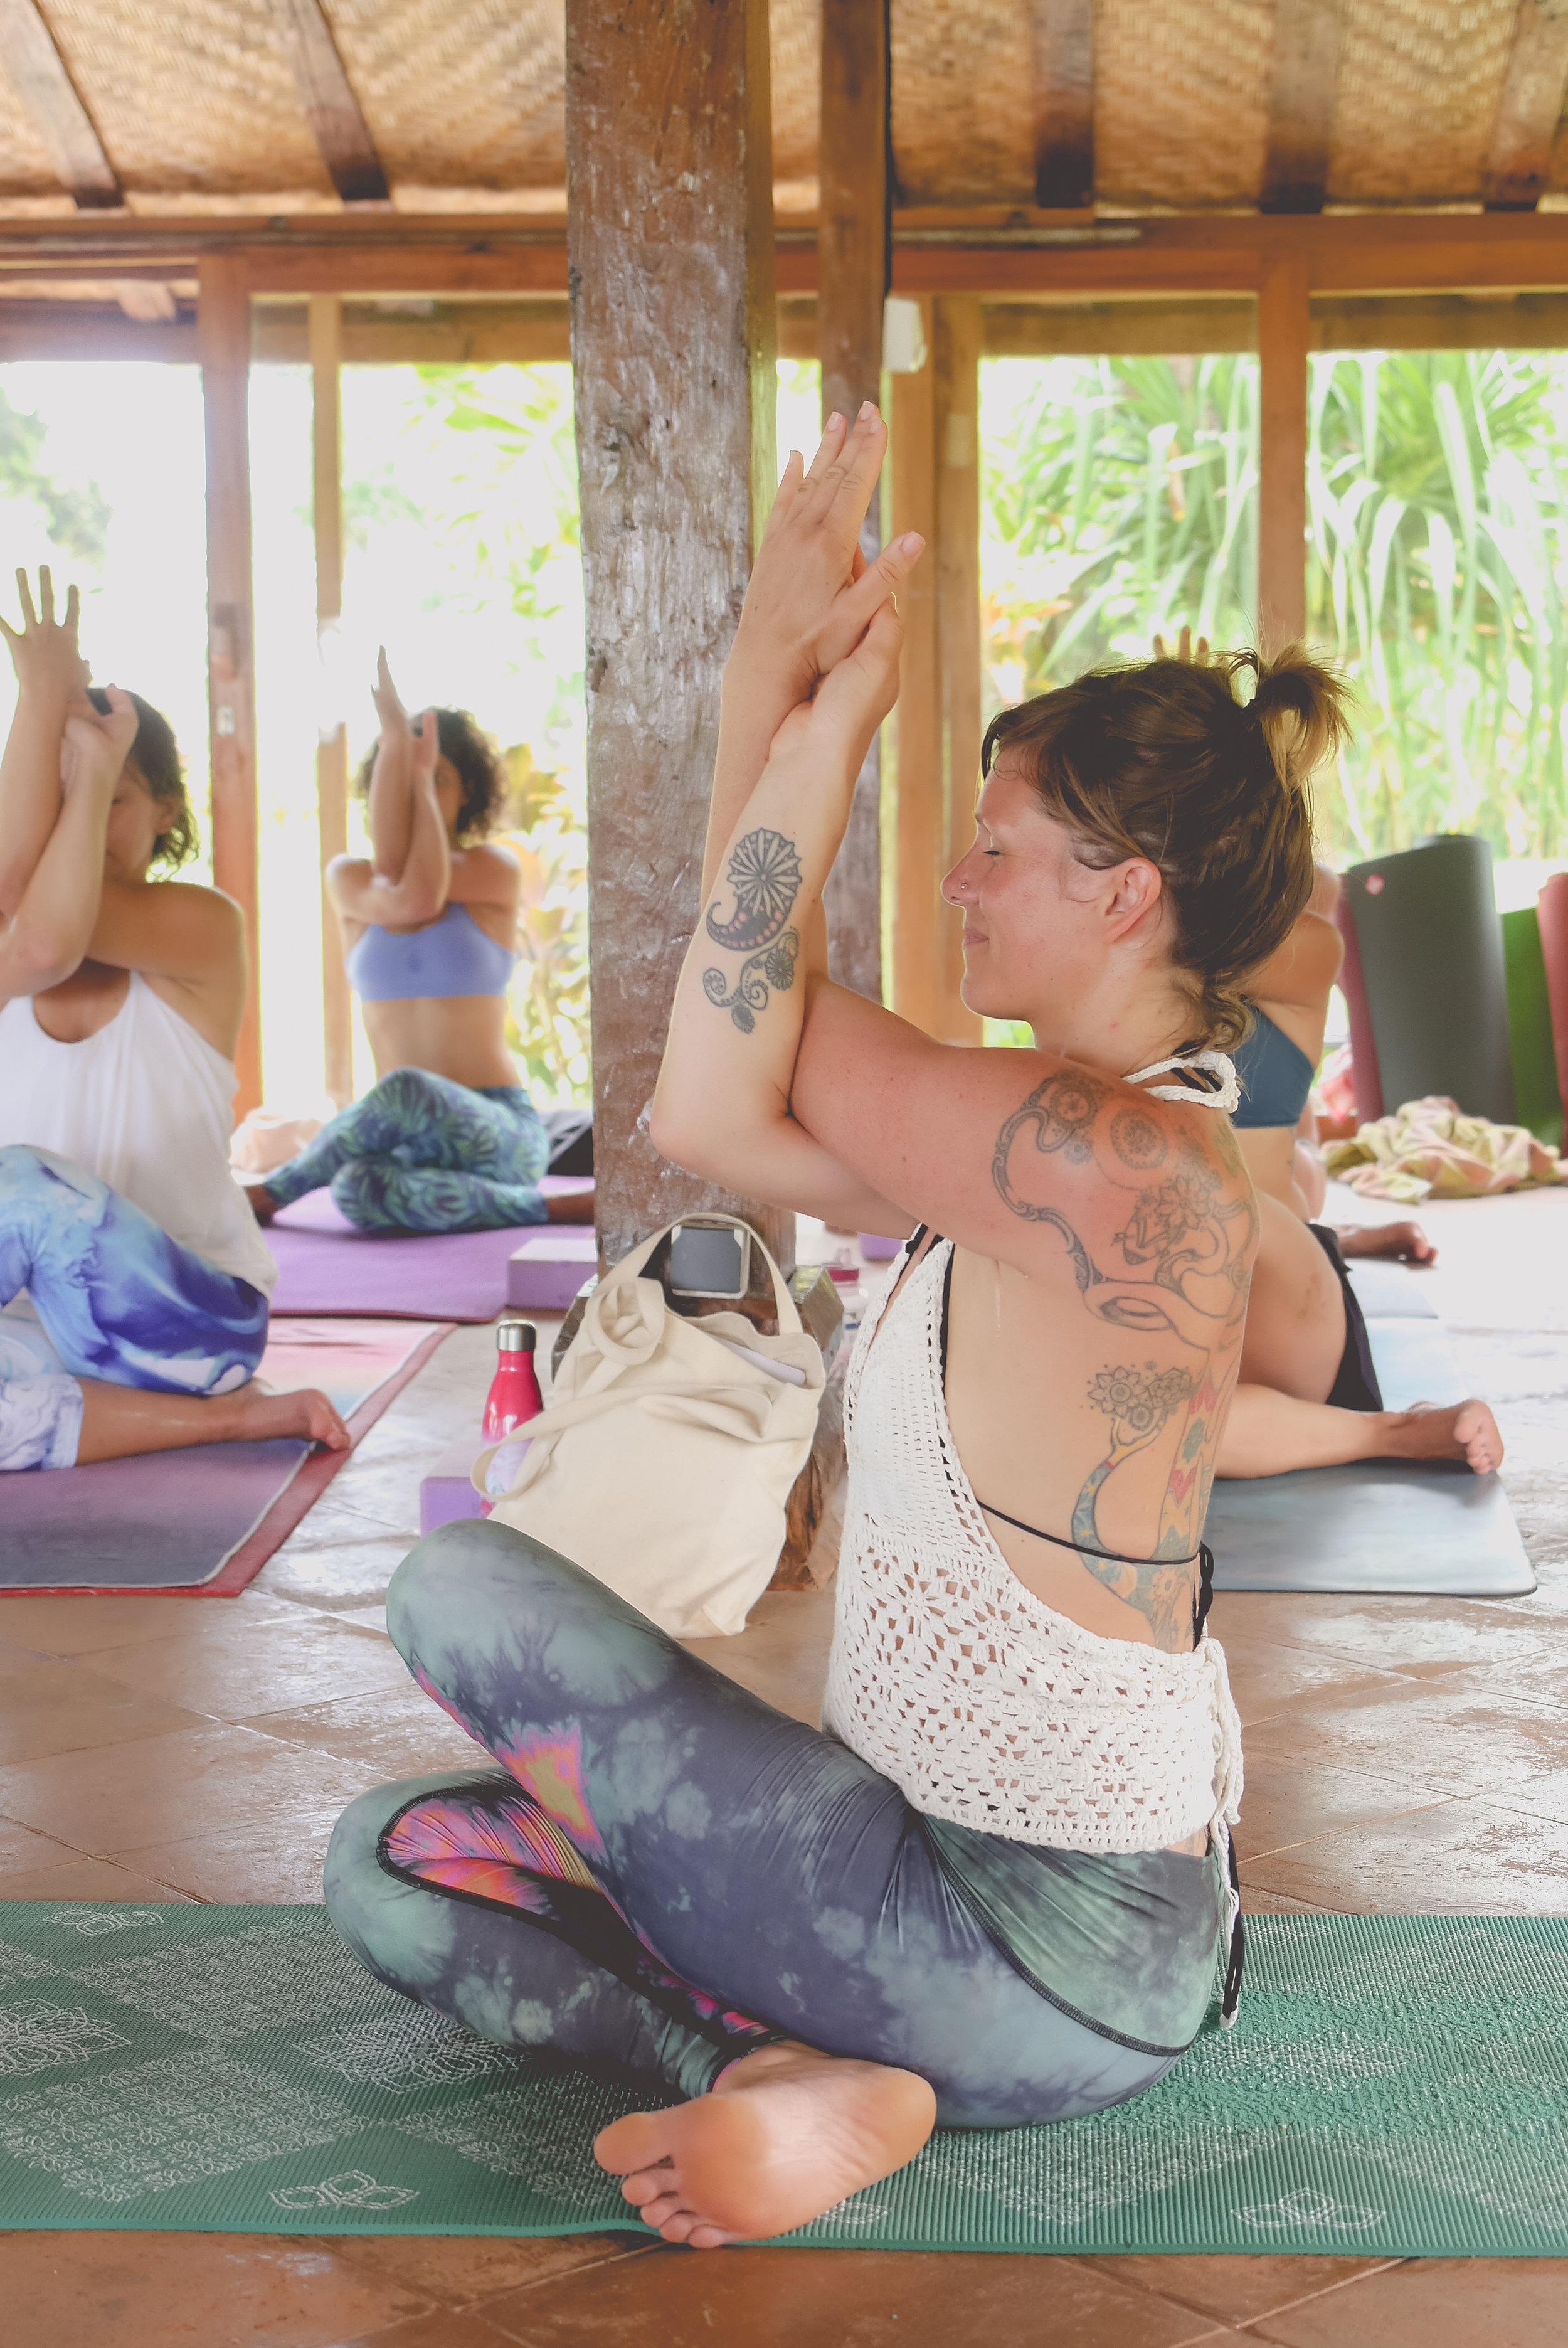 Demo time. Photo: Exhale Yoga Retreats.